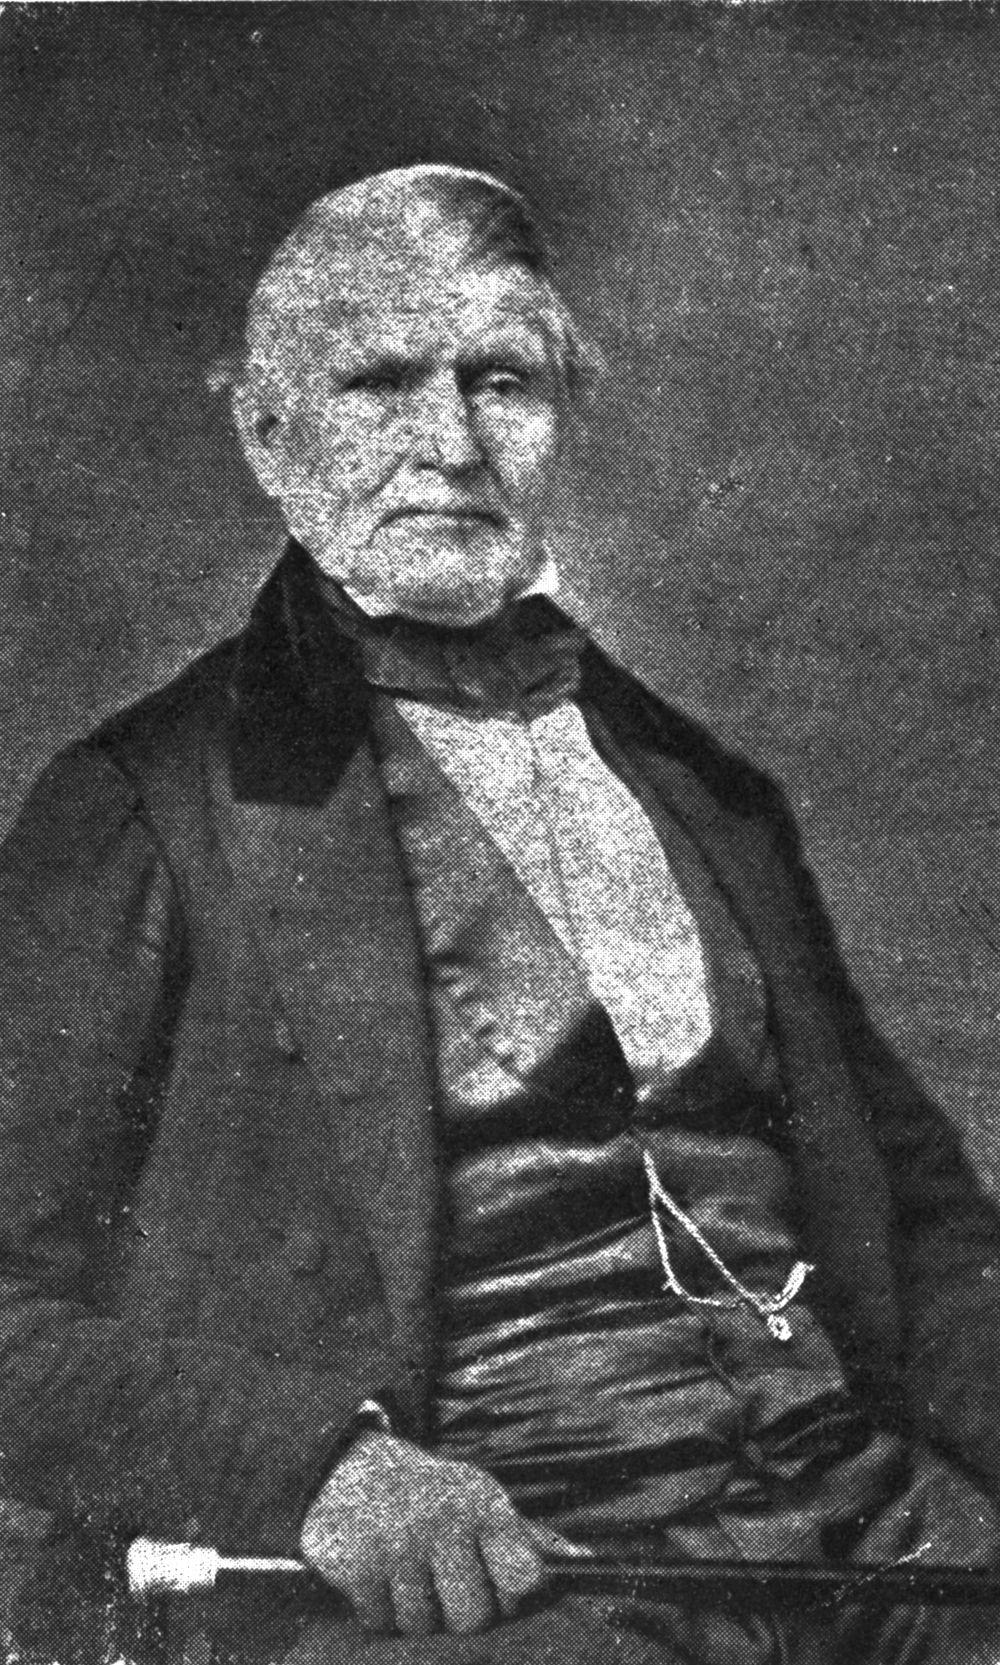 Joseph Parks